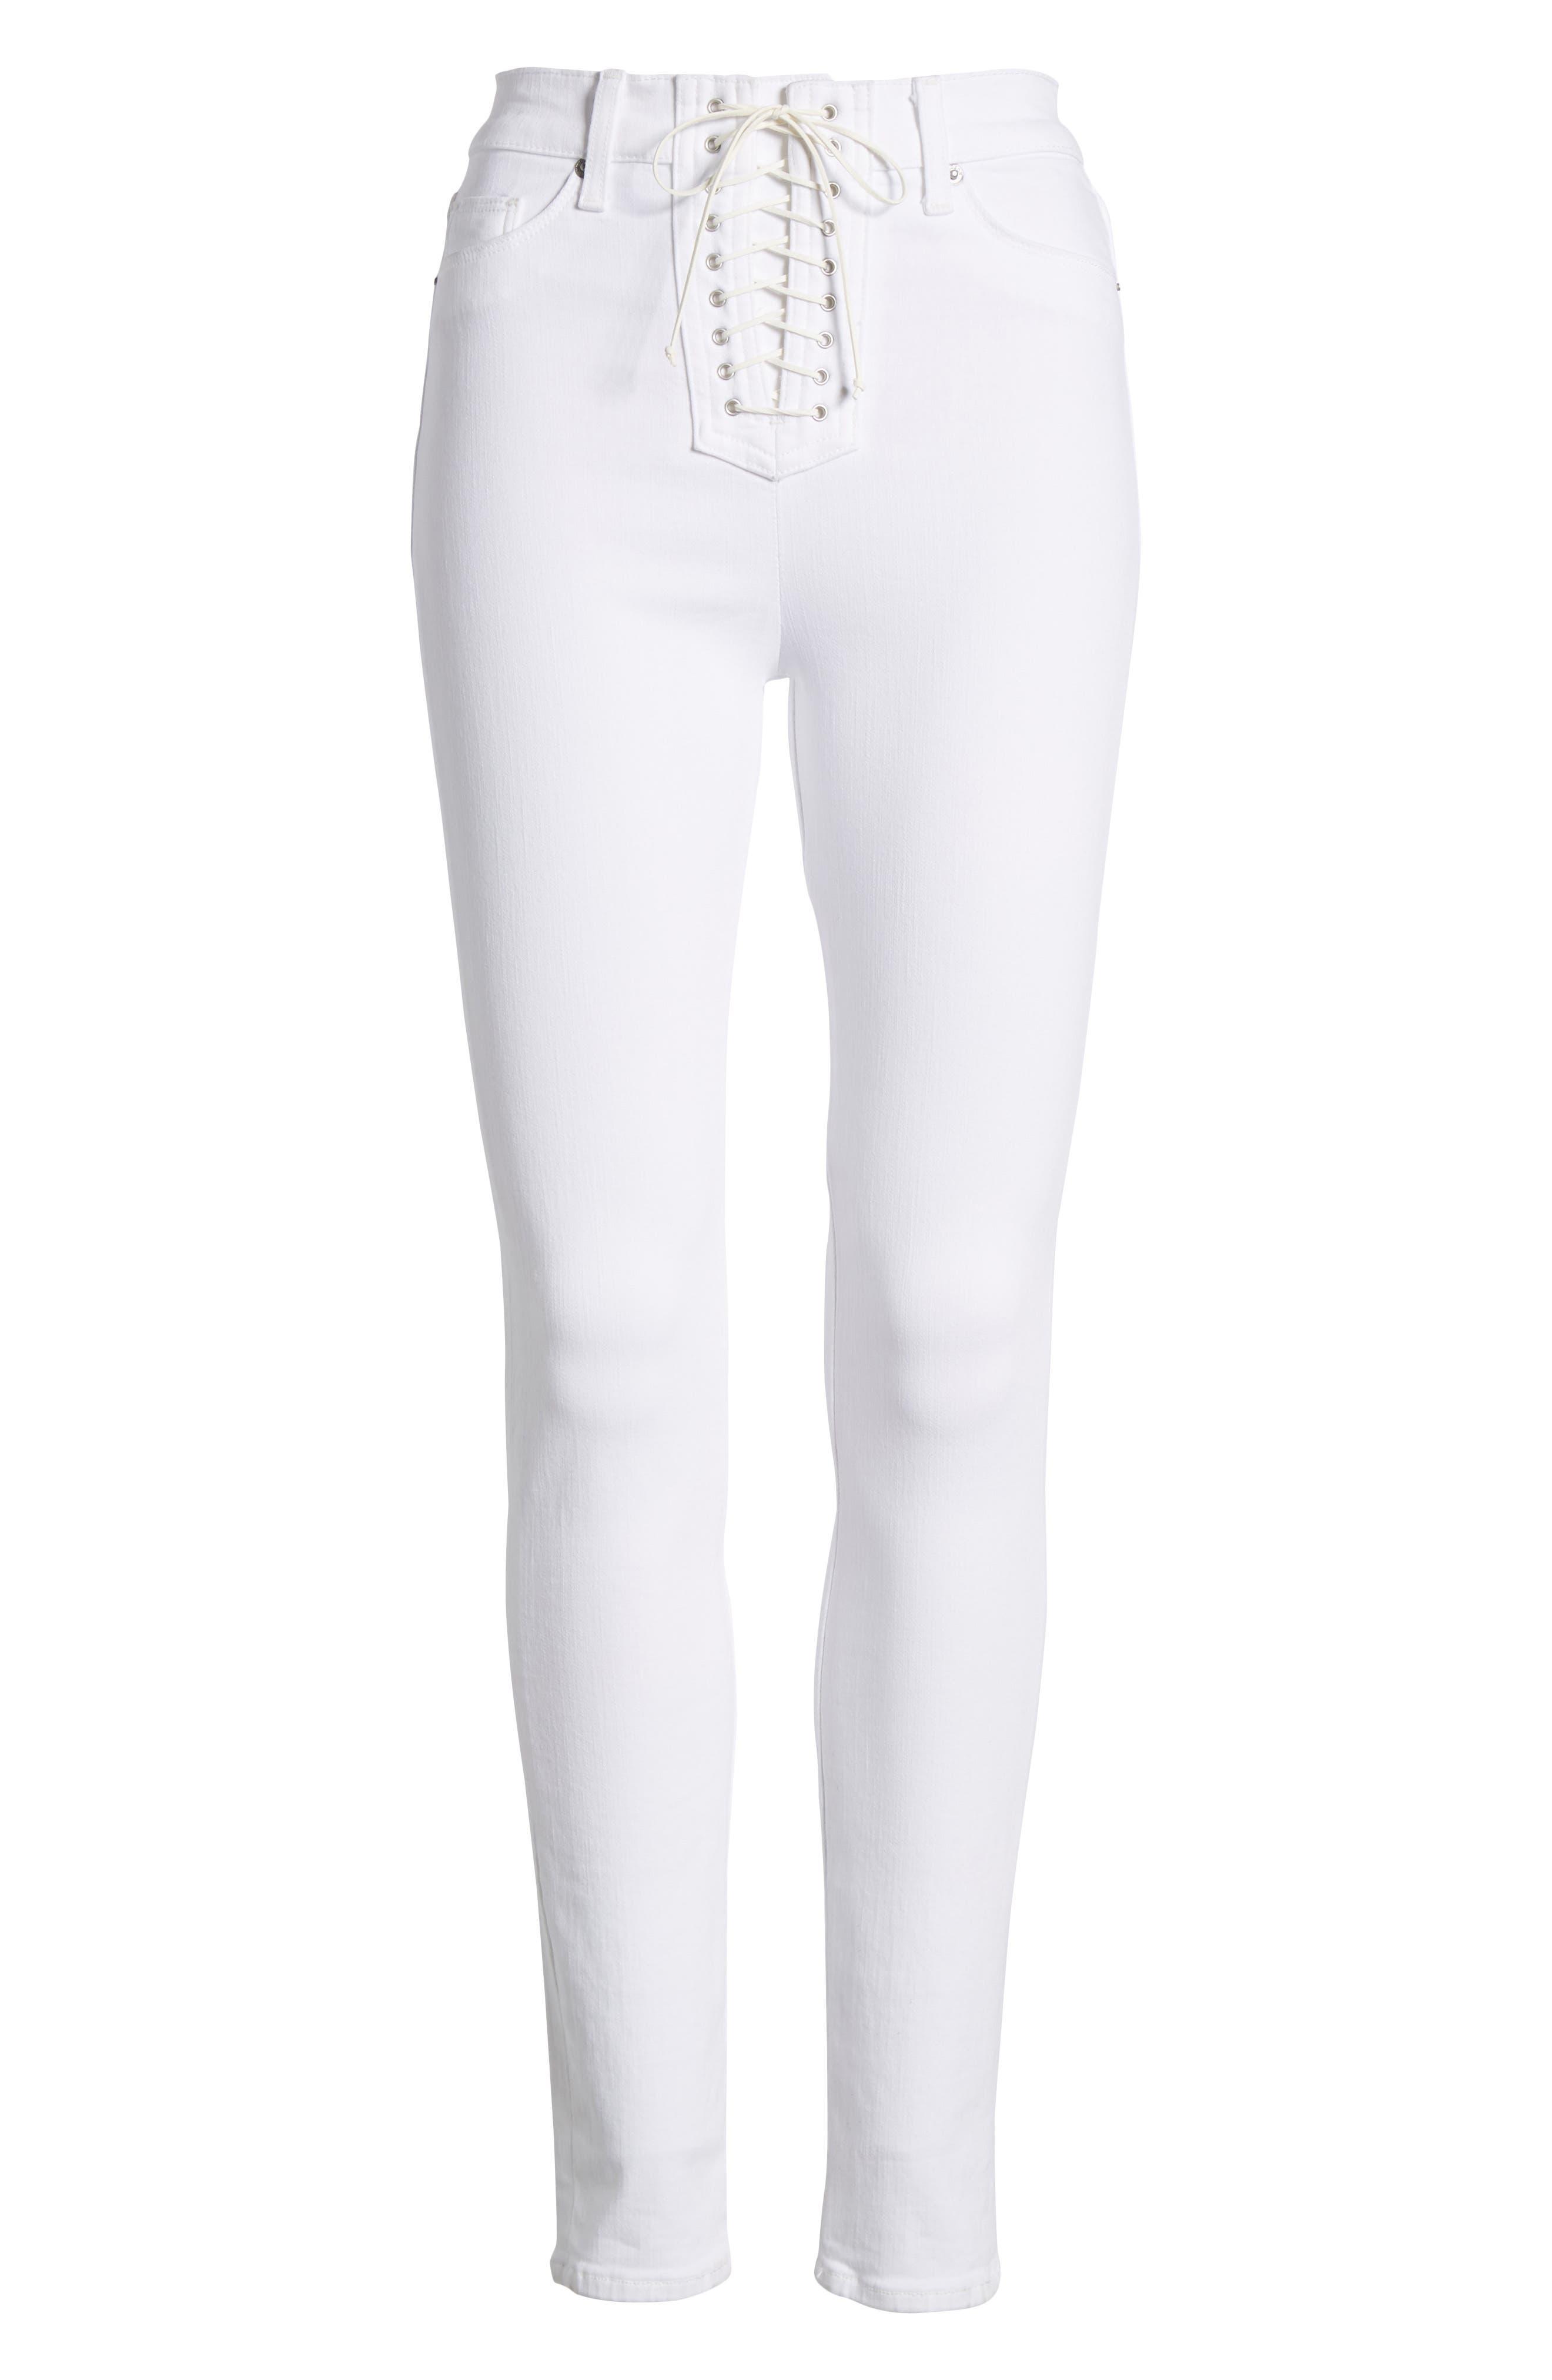 HUDSON JEANS,                             Bullocks Lace-Up High Waist Super Skinny Jeans,                             Alternate thumbnail 6, color,                             110